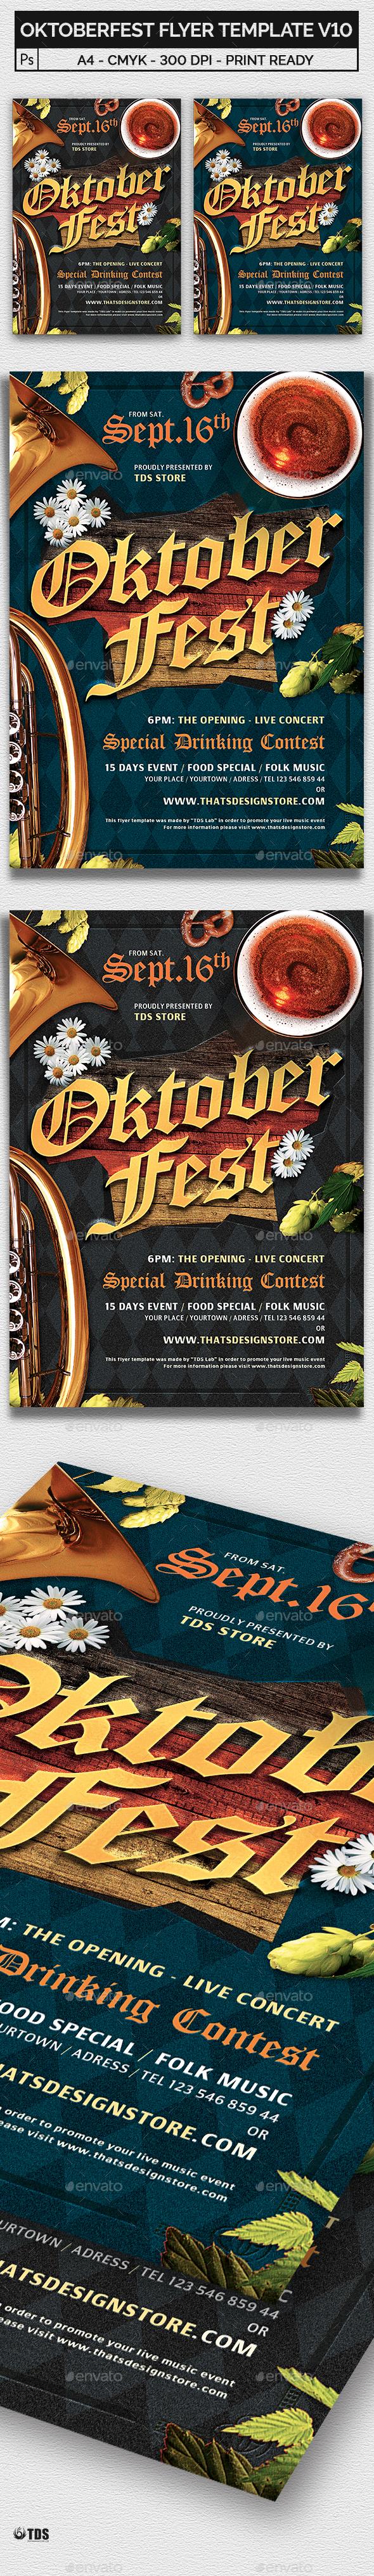 Oktoberfest Flyer Template V10 - Holidays Events